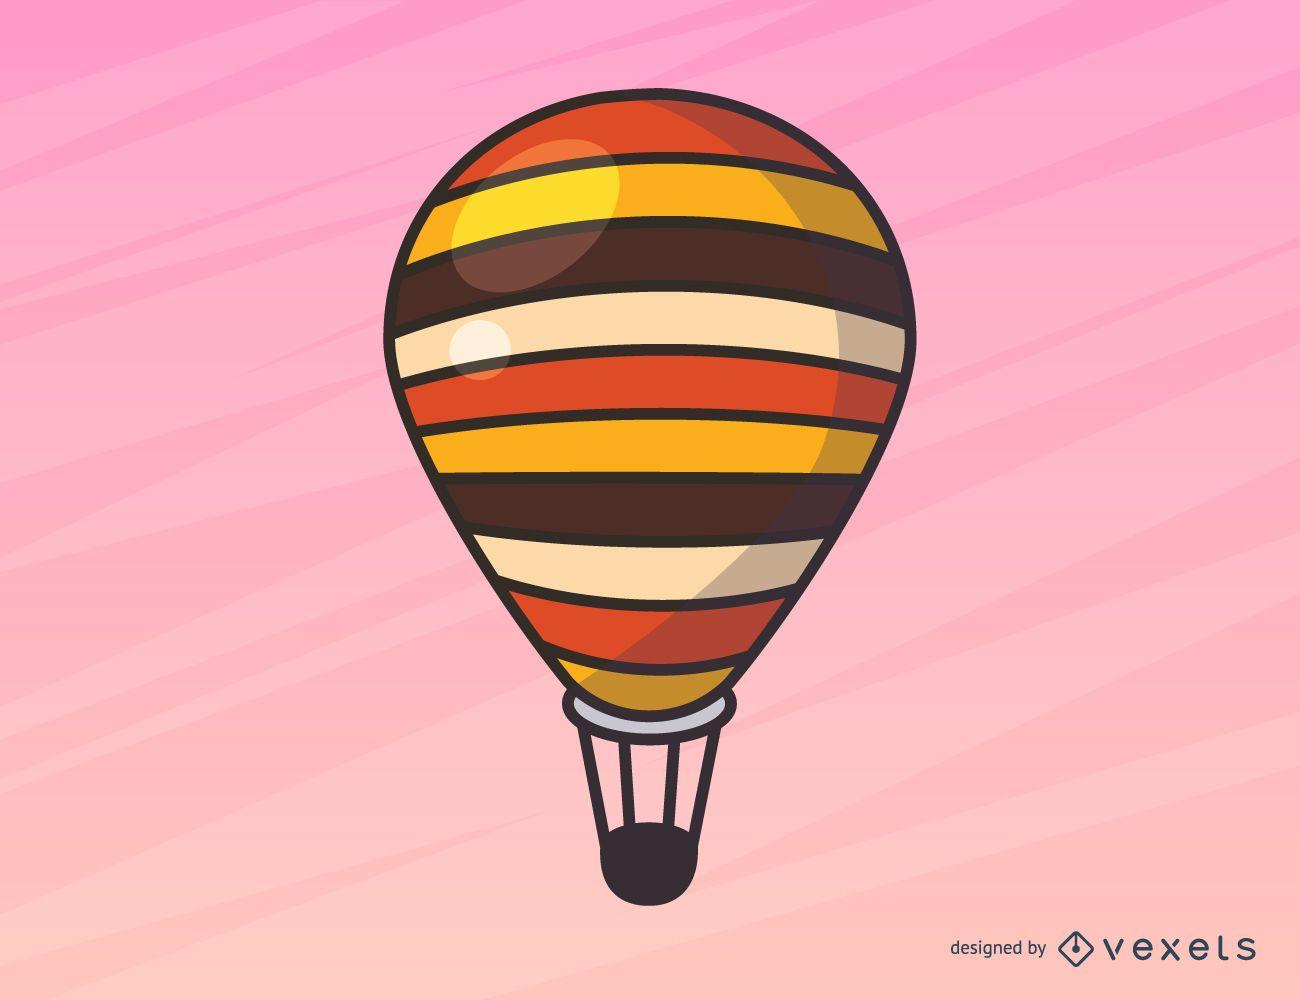 Simple hot air balloon illustration